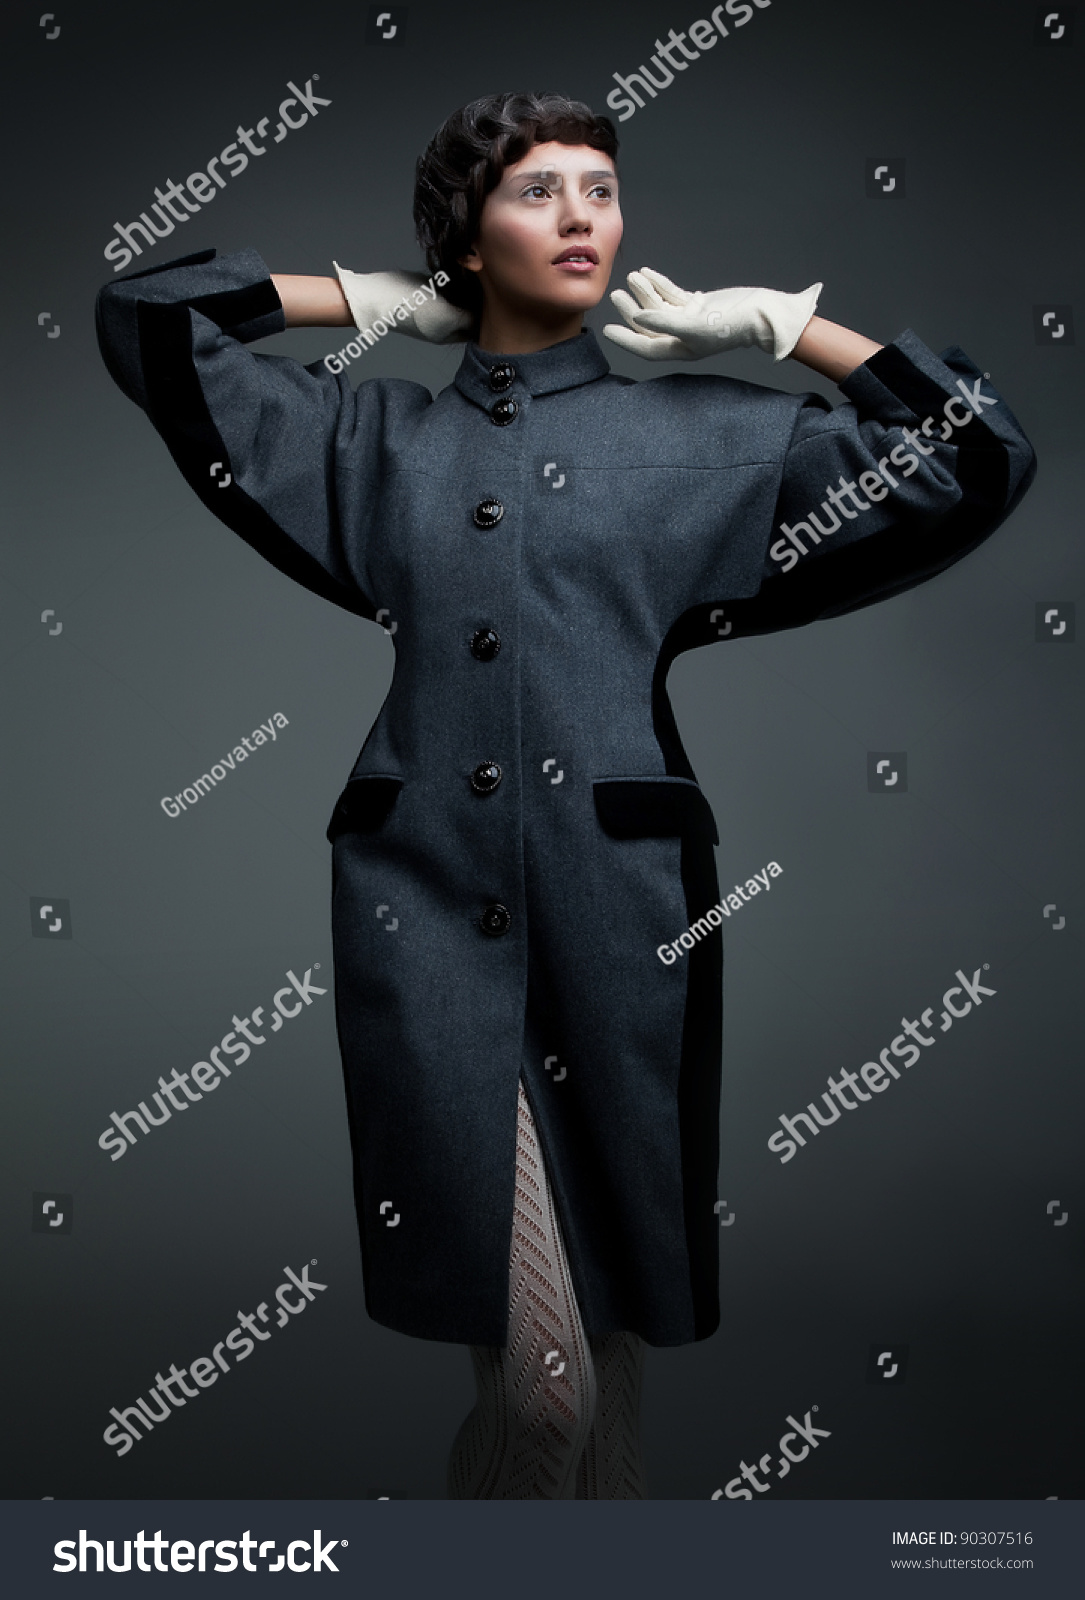 Retro Style Fashion Design Shows Supermodel Lovely